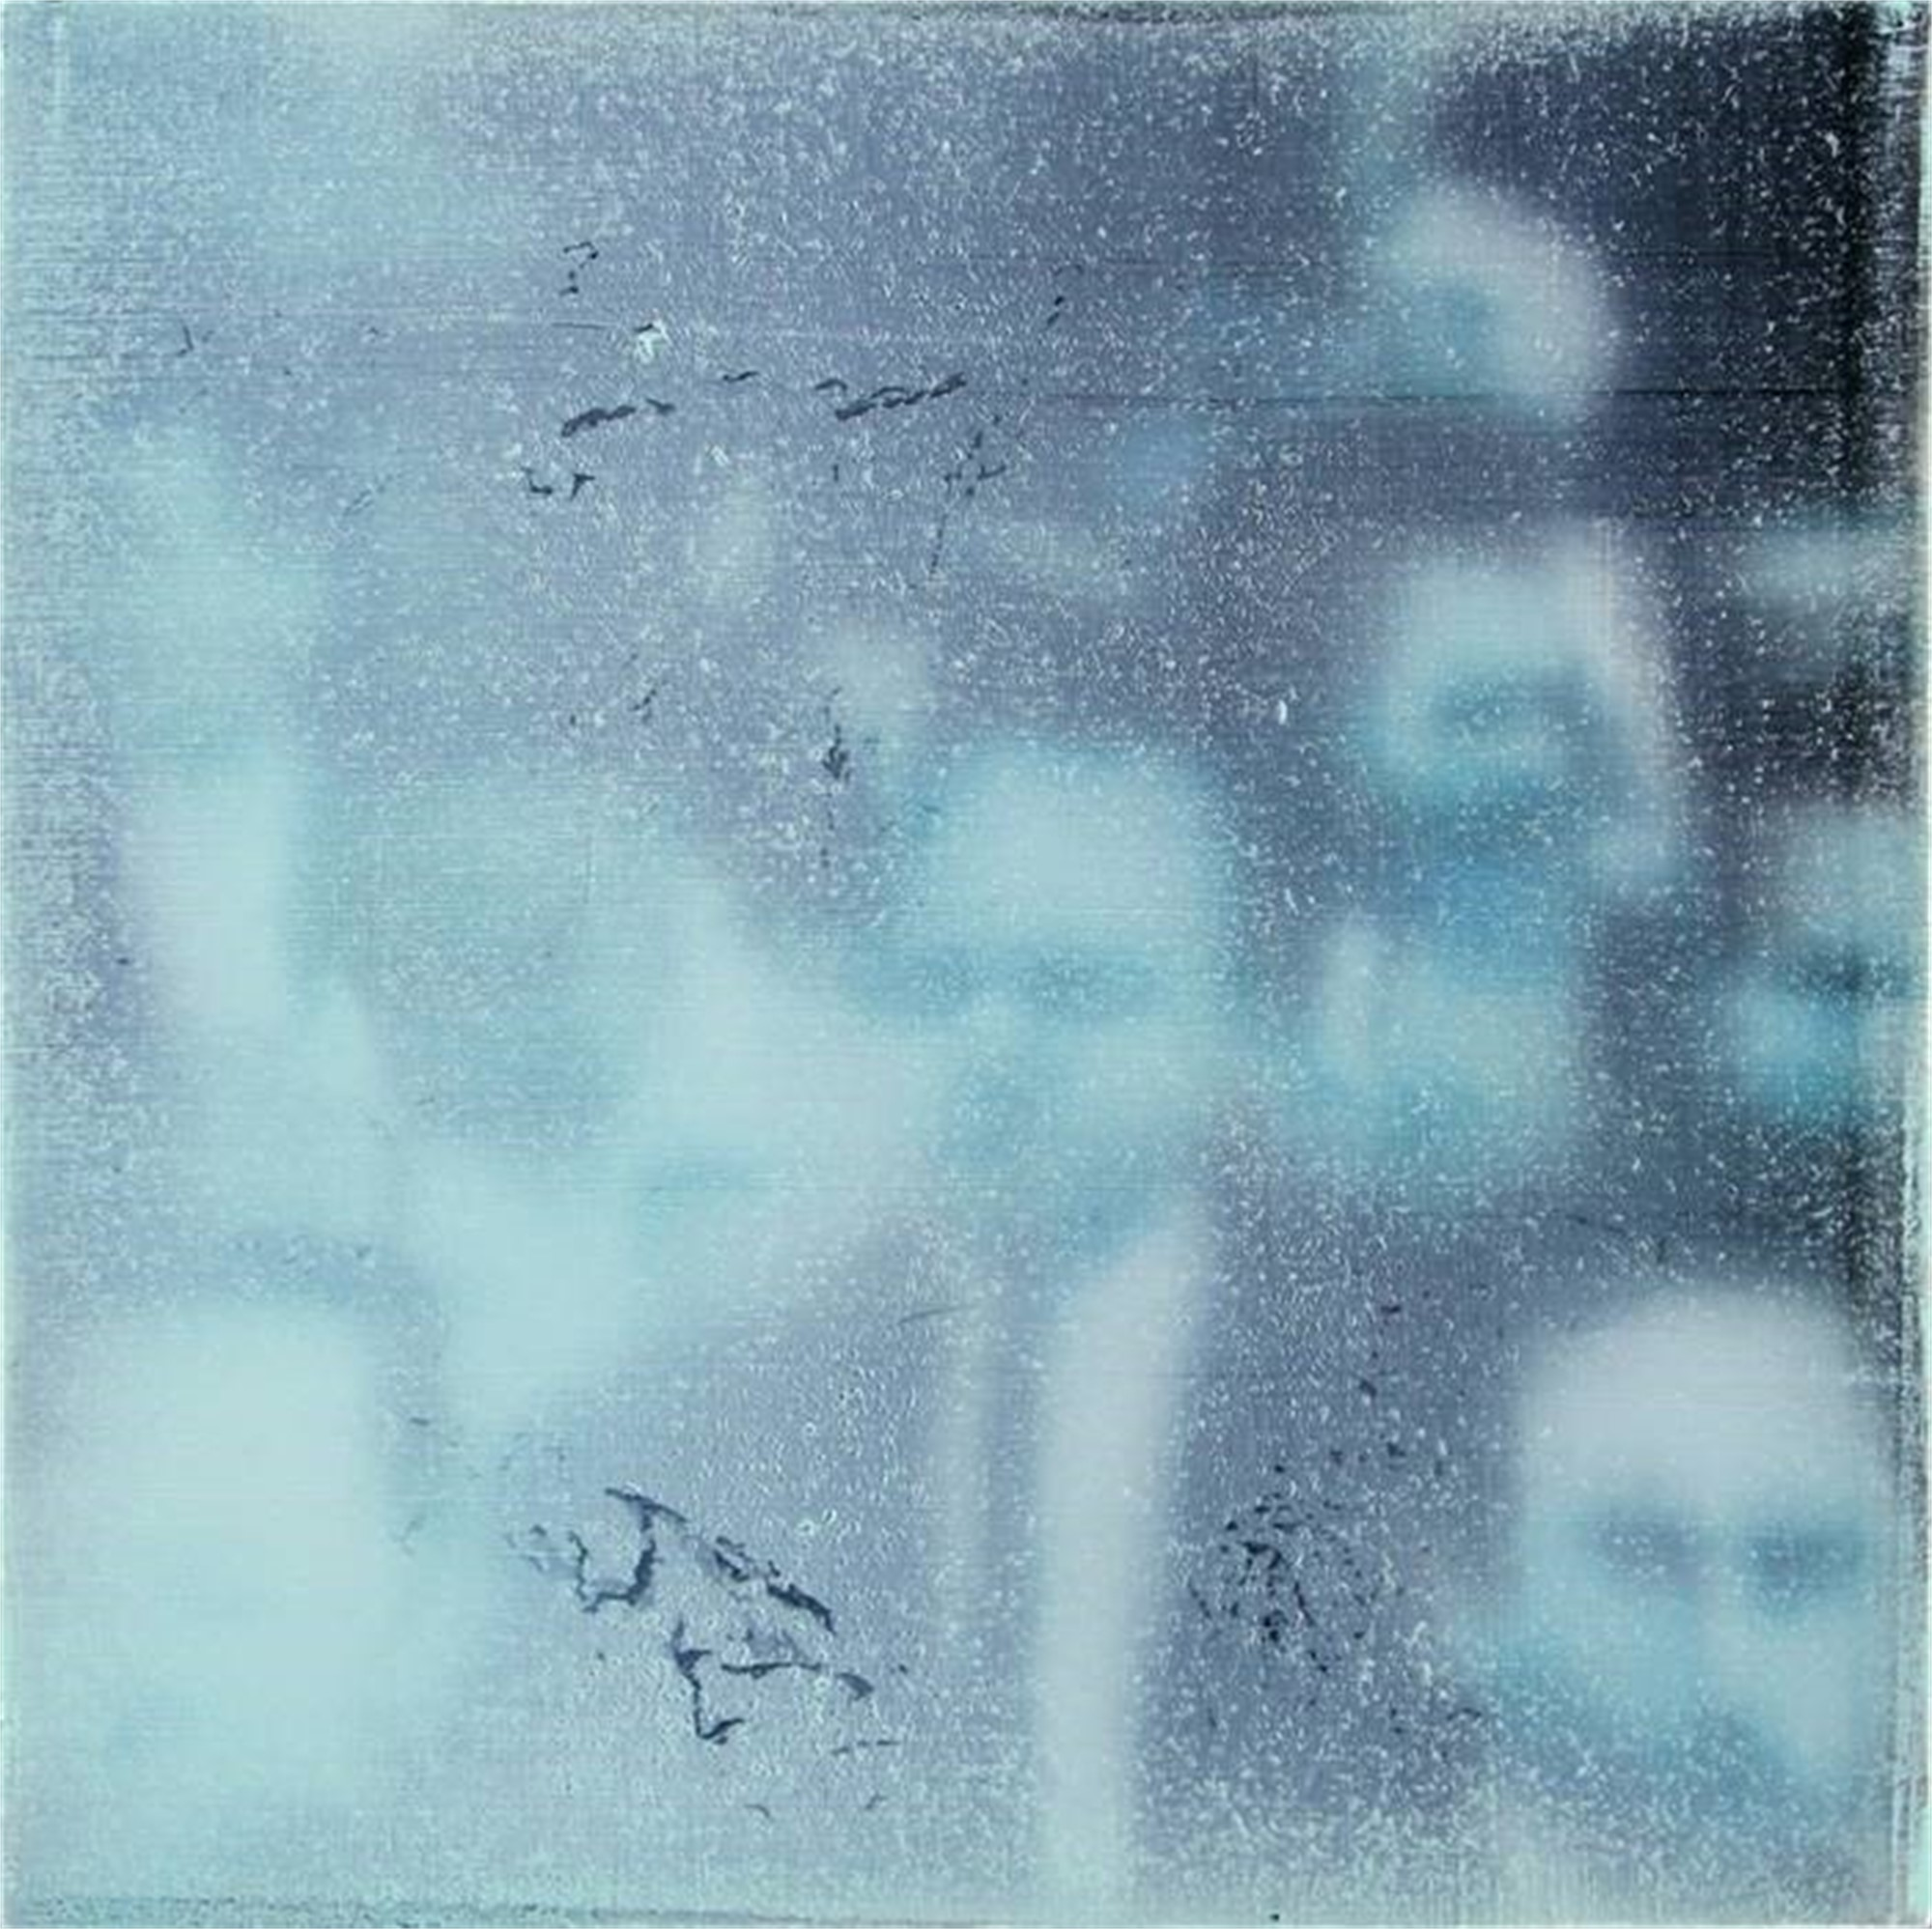 Crowd Study III by Wendelin Wohlgemuth